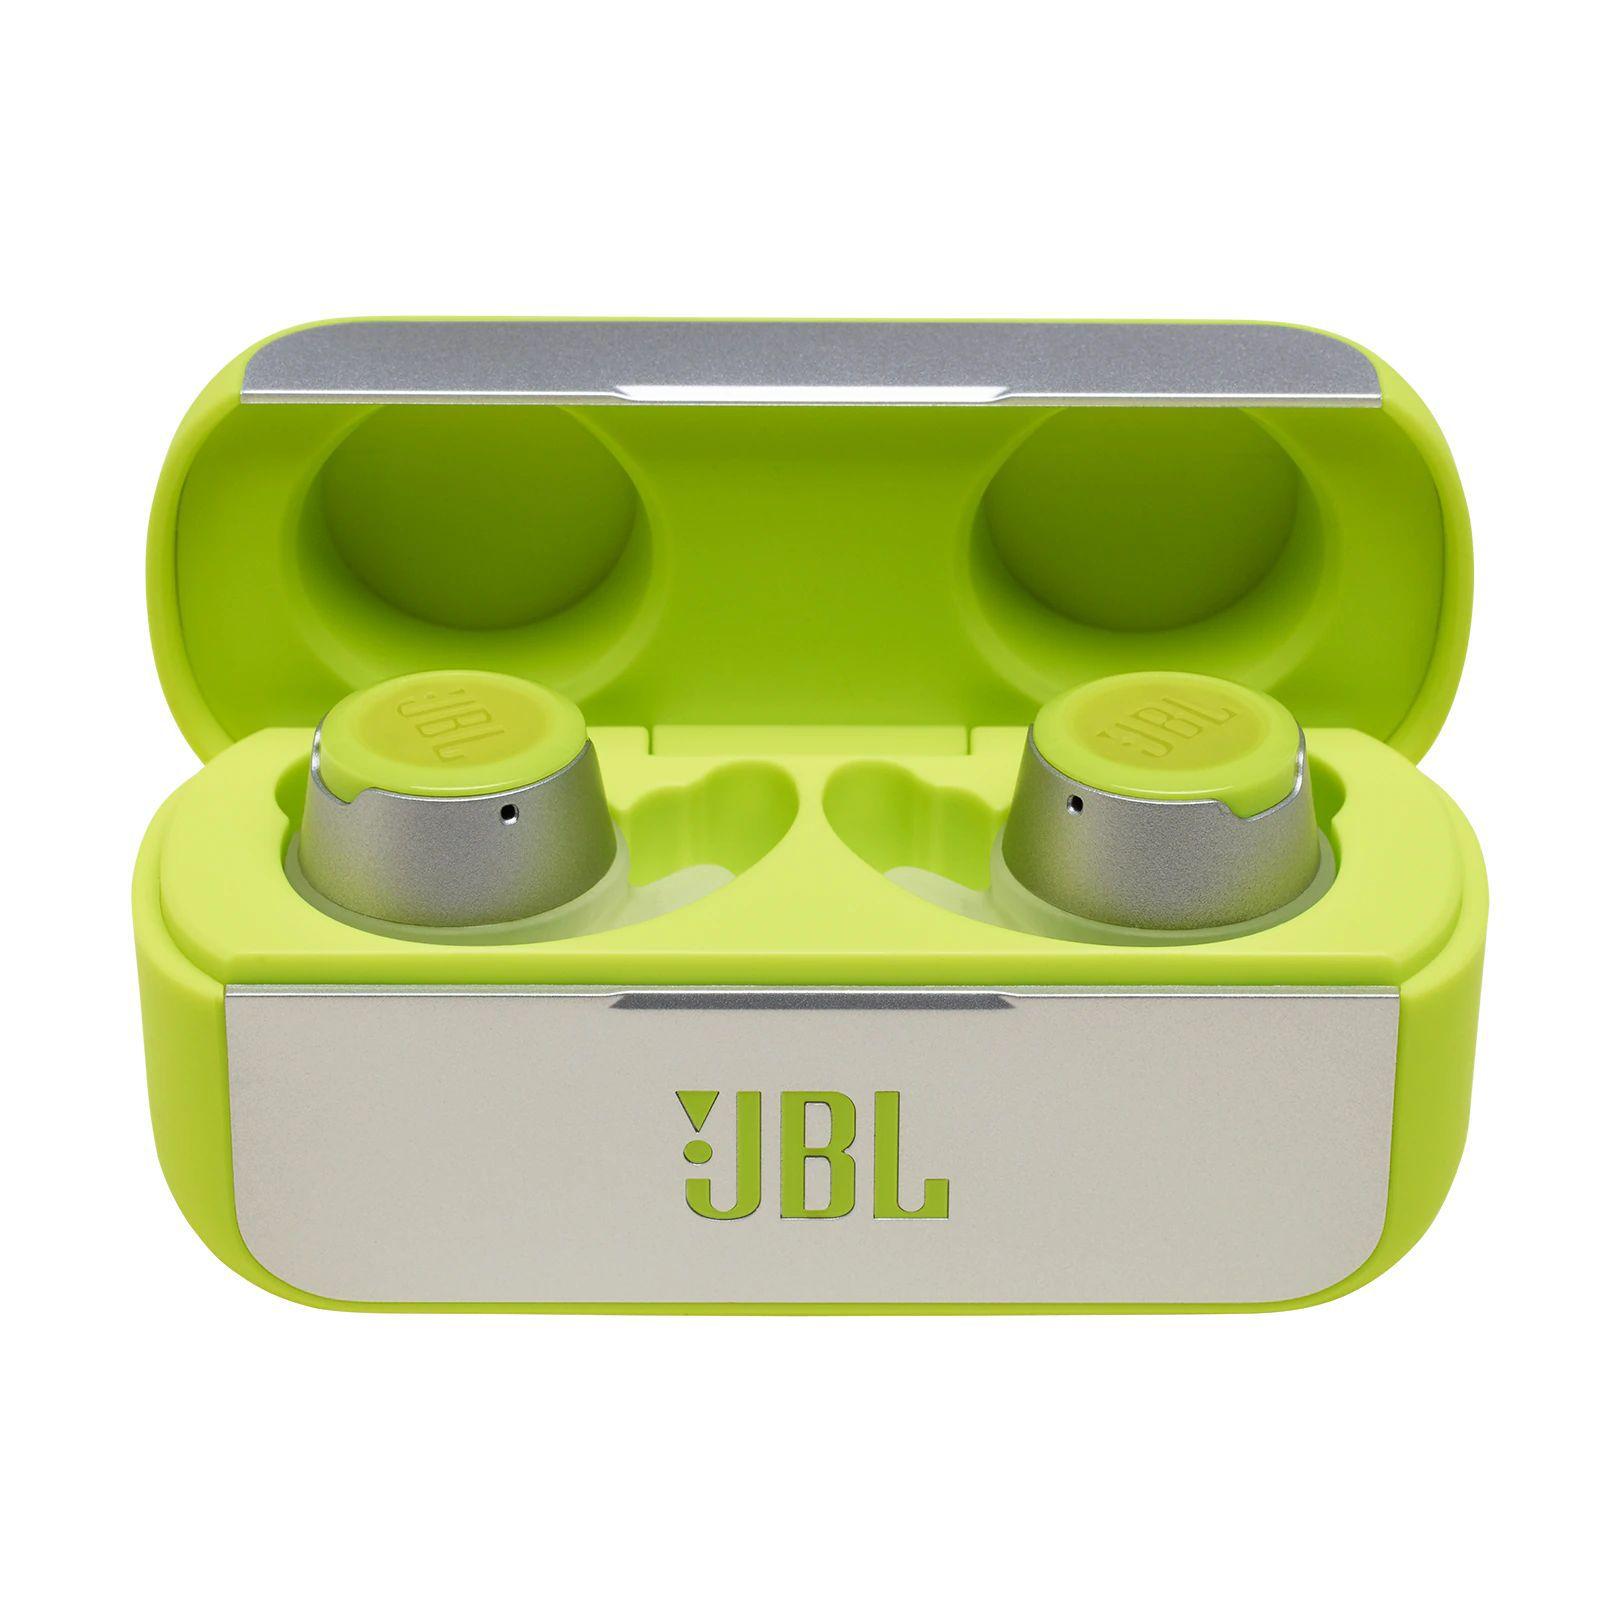 Fone de Ouvido Bluetooth JBL Reflect Flow - Verde JBLREFFLOWGRN